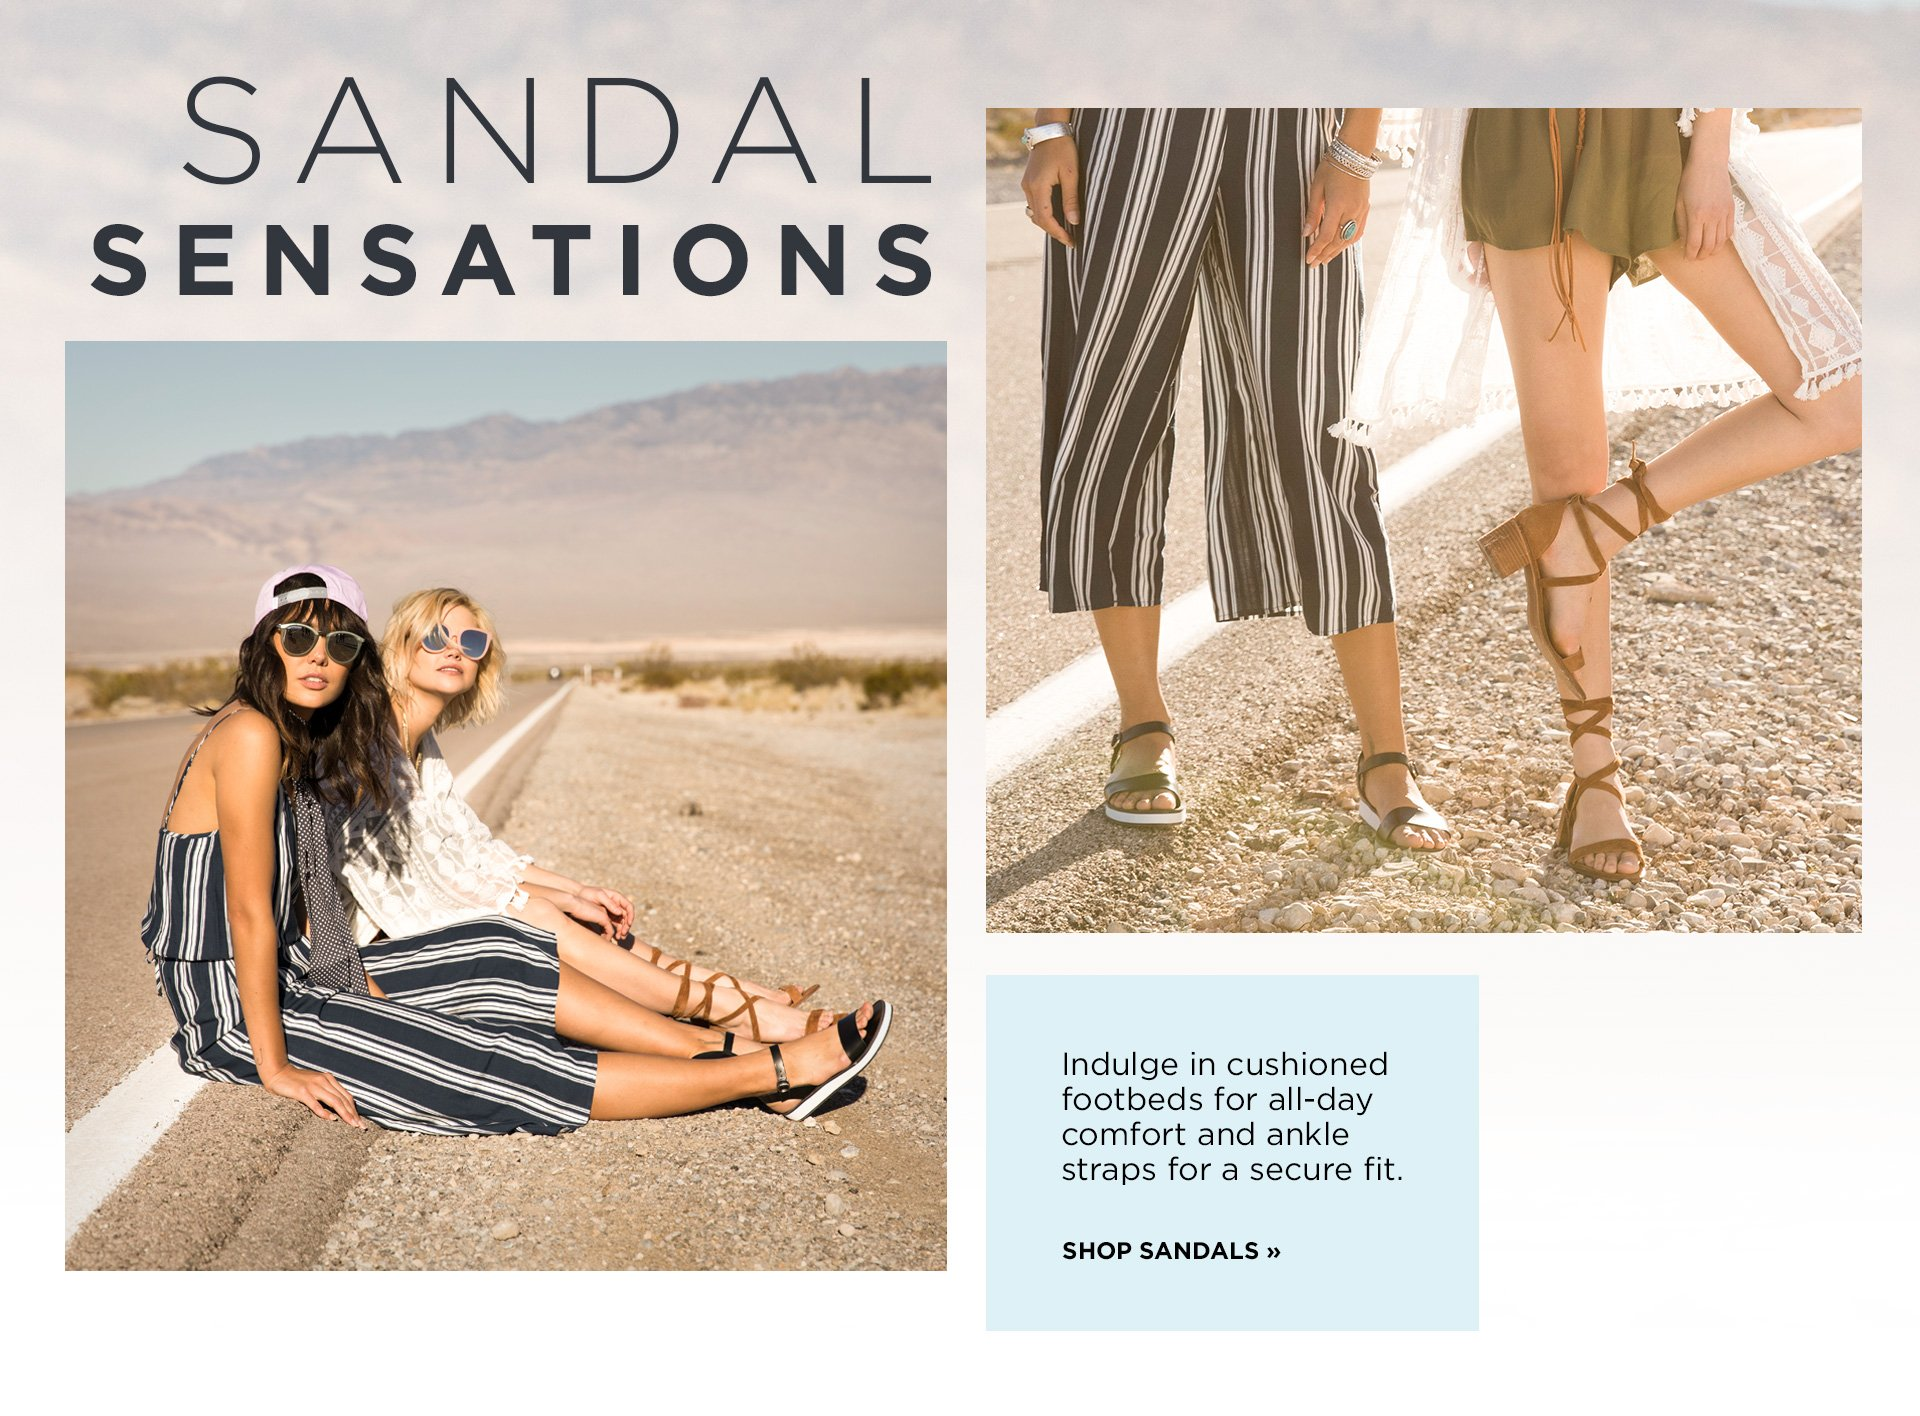 Sandal Sensations